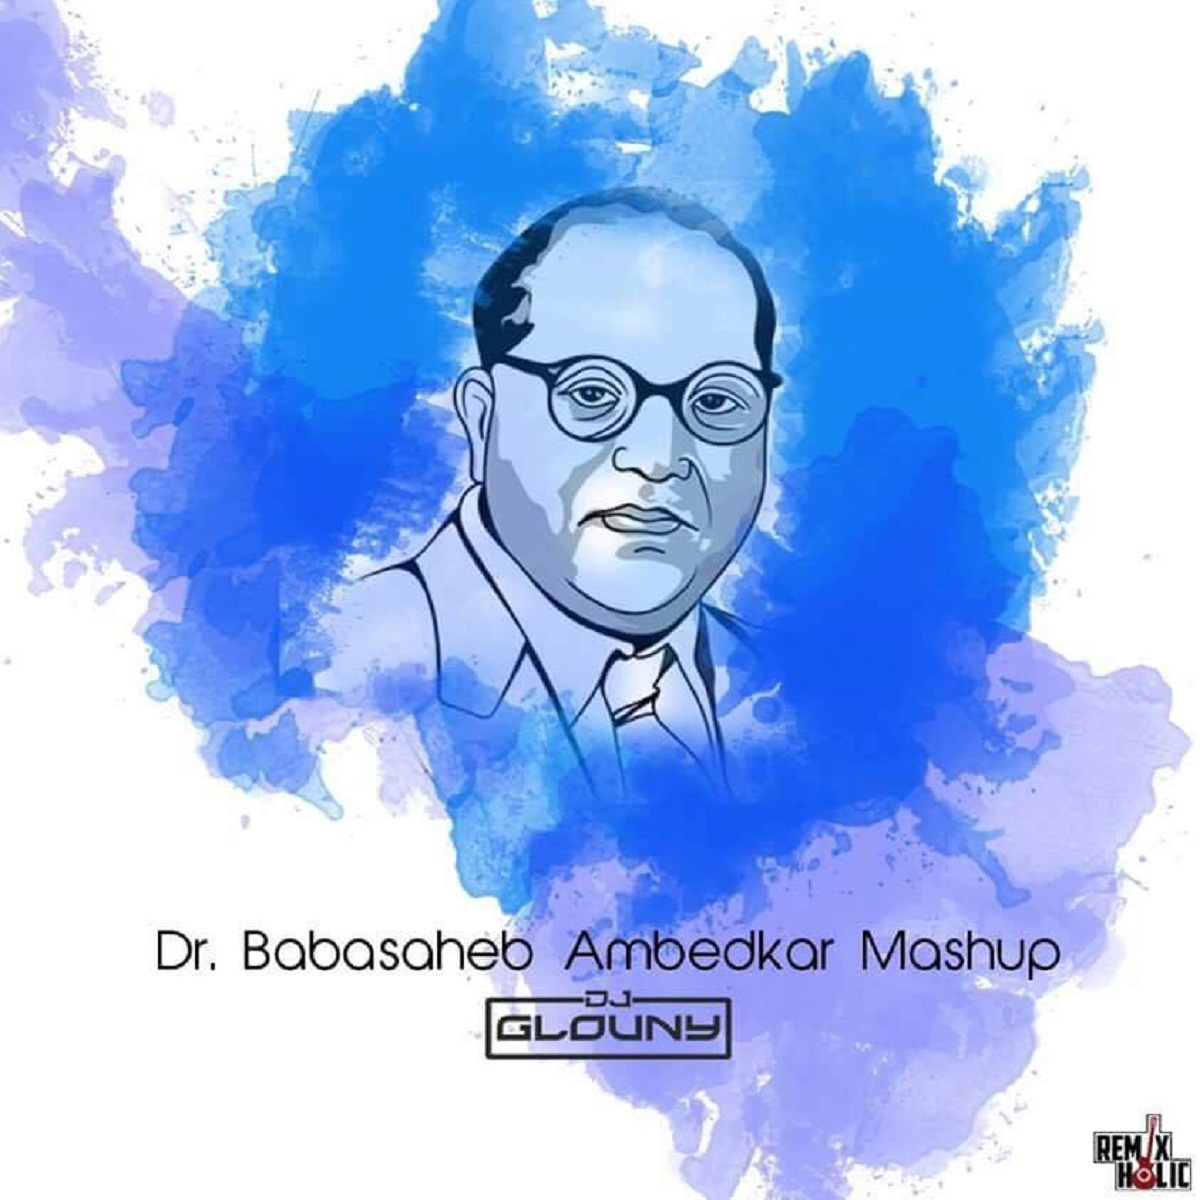 Bhagwa Rang Dj: Dr. Babasaheb Ambedkar Mashup